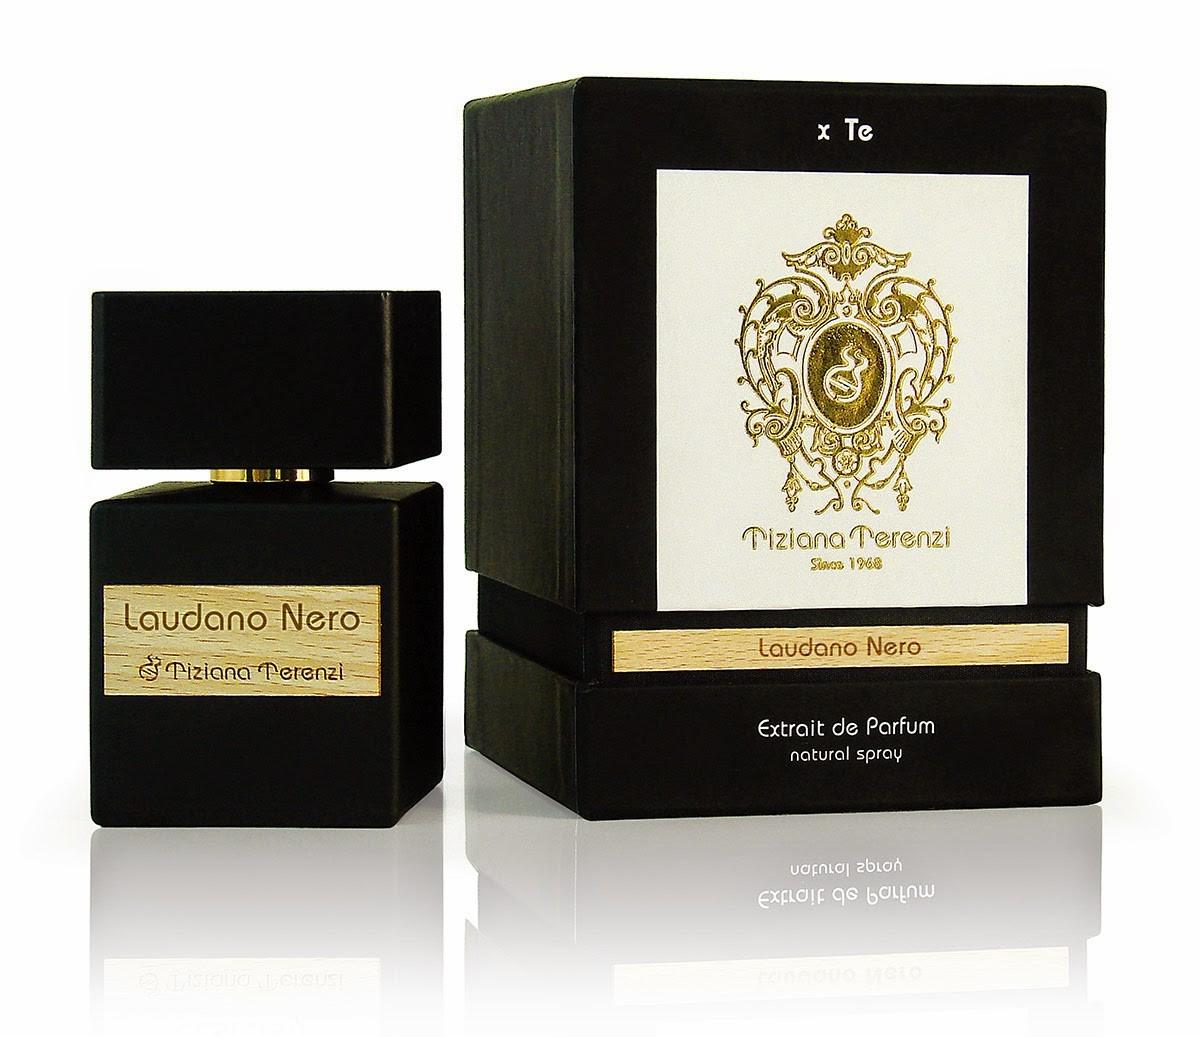 Tiziana Terenzi Laudano Nero аромат для мужчин и женщин